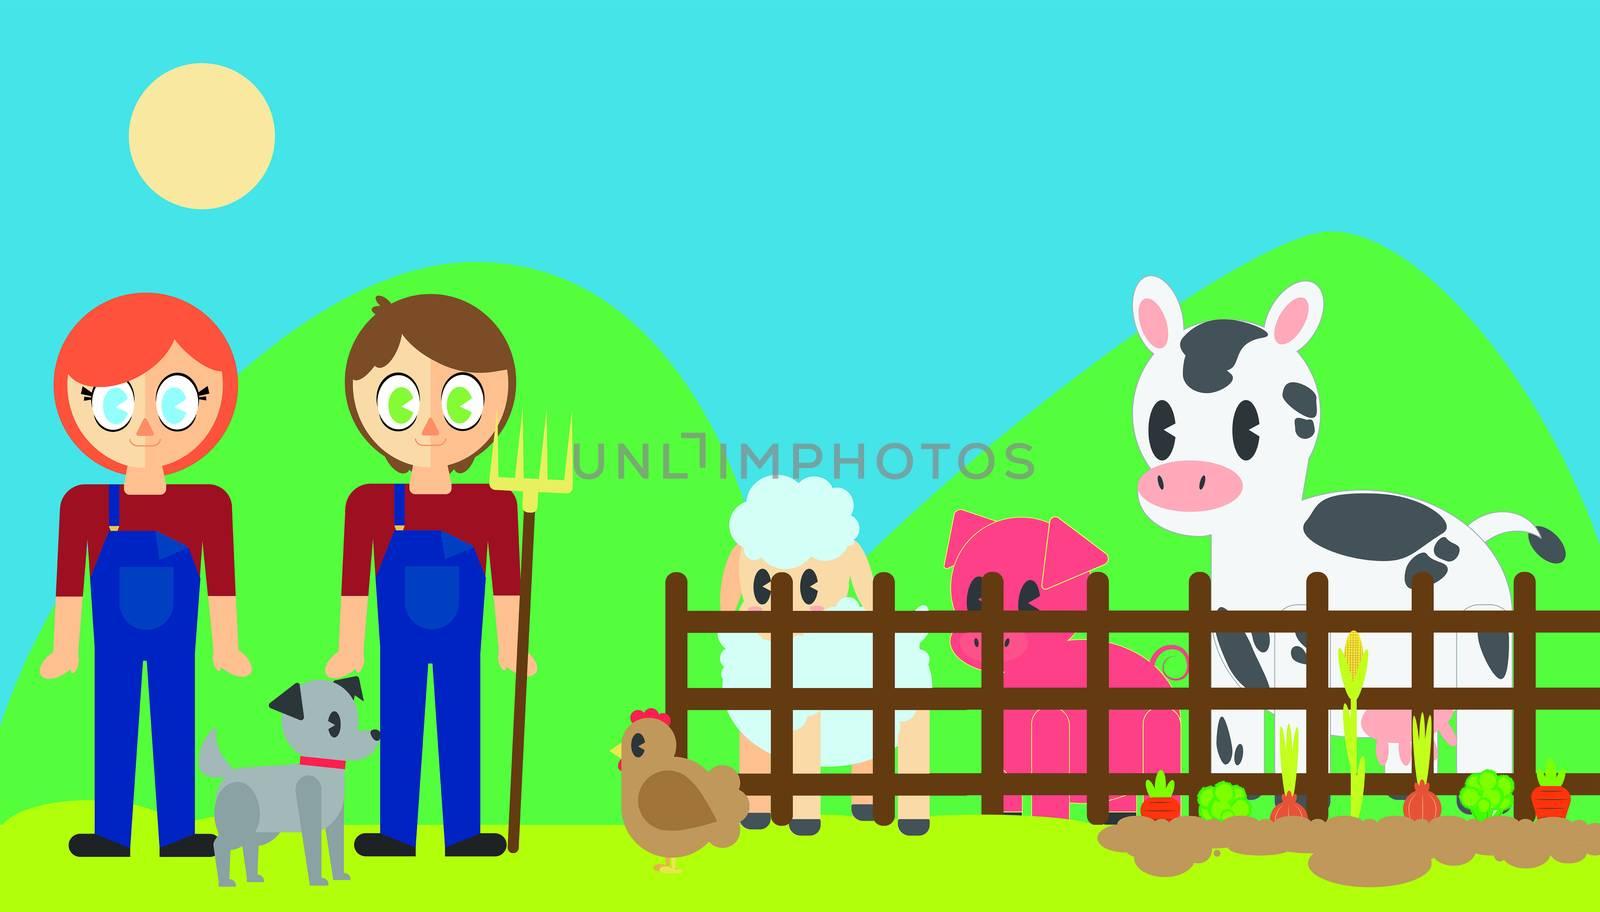 Farmers with pets in poultry farm by Wavebreakmedia